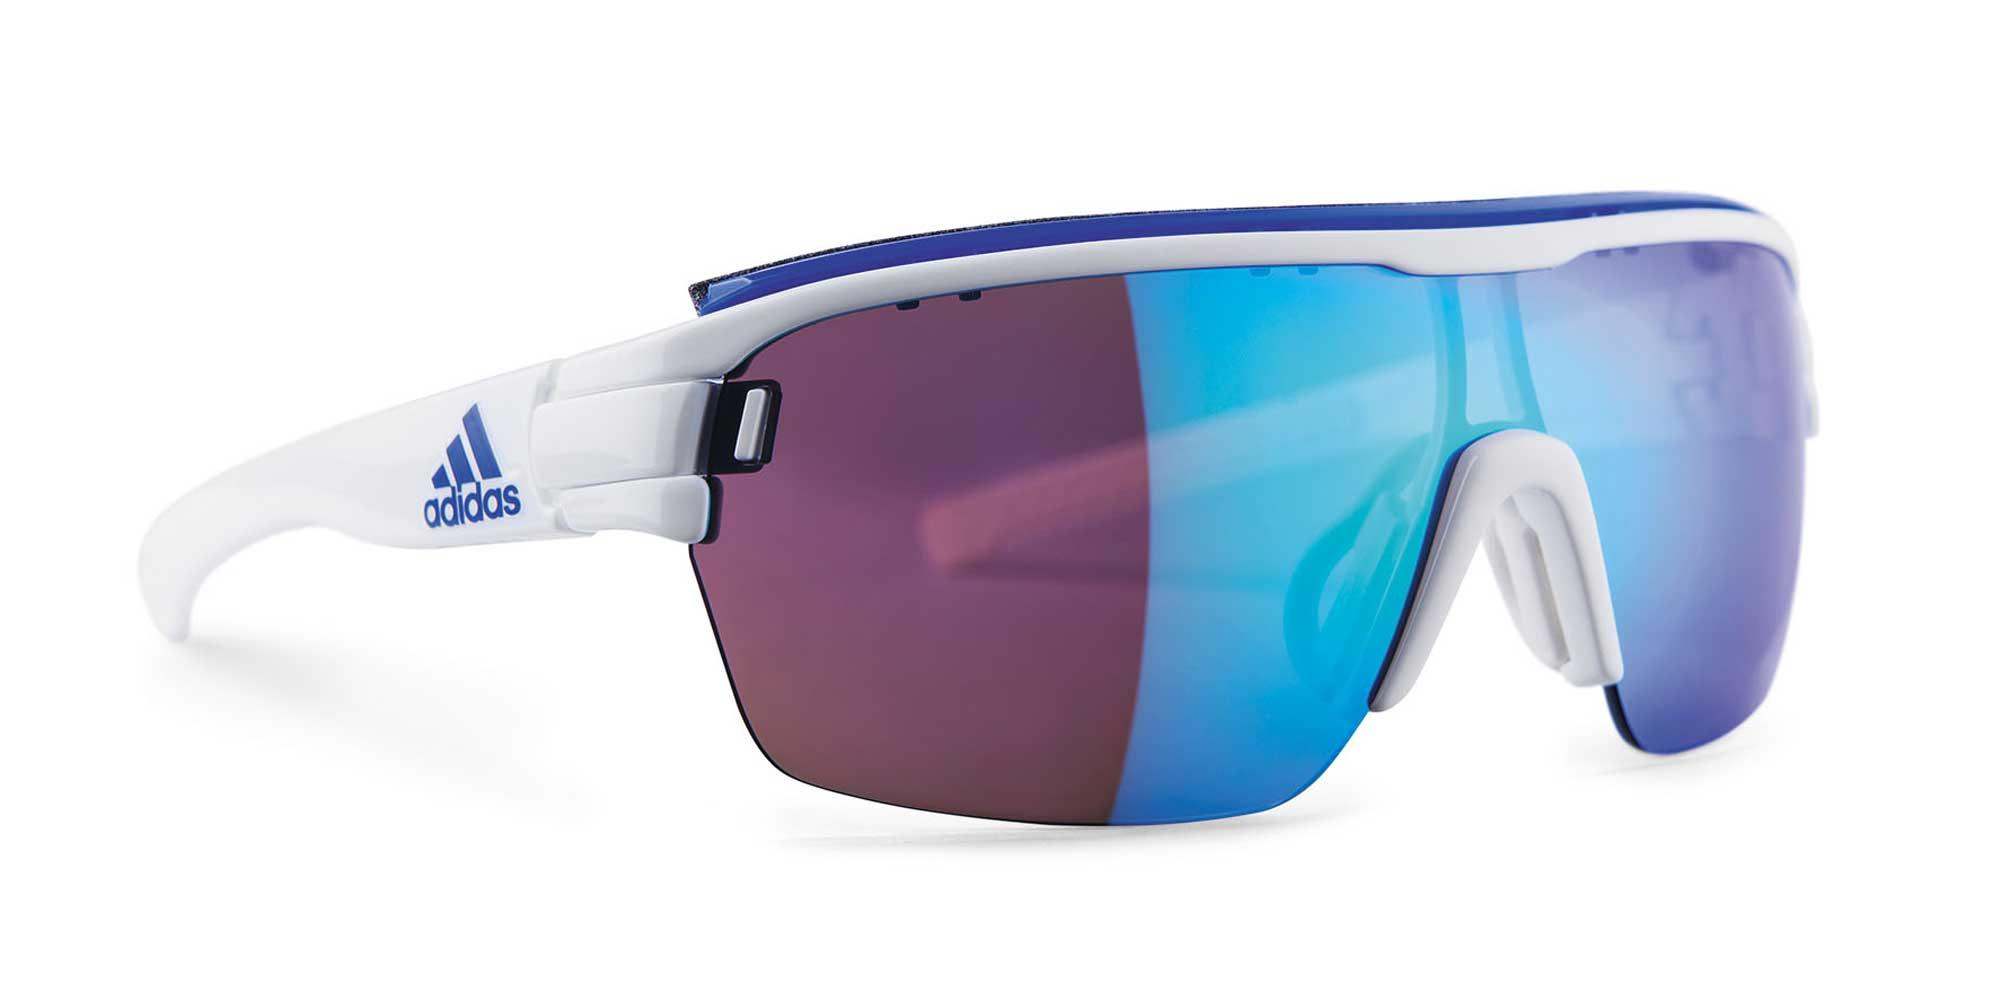 Adidas gafas ad06 zonyk Aero large Crystal Matt 1000 Purple Mirror